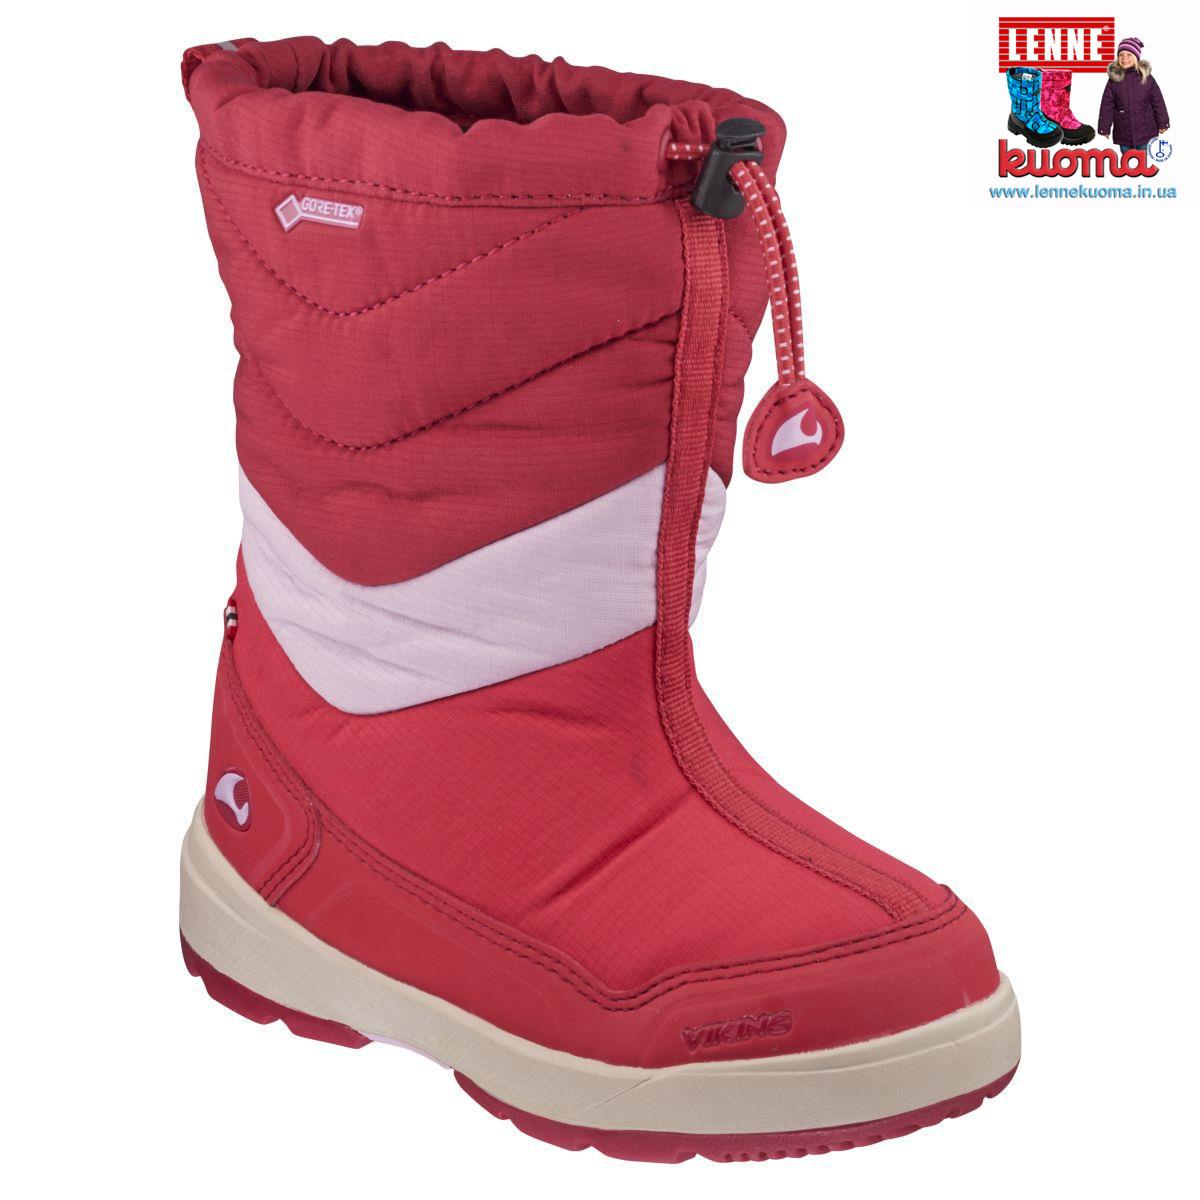 VIKING HALDEN GORE TEX зимние ботинки. Размеры 23-33